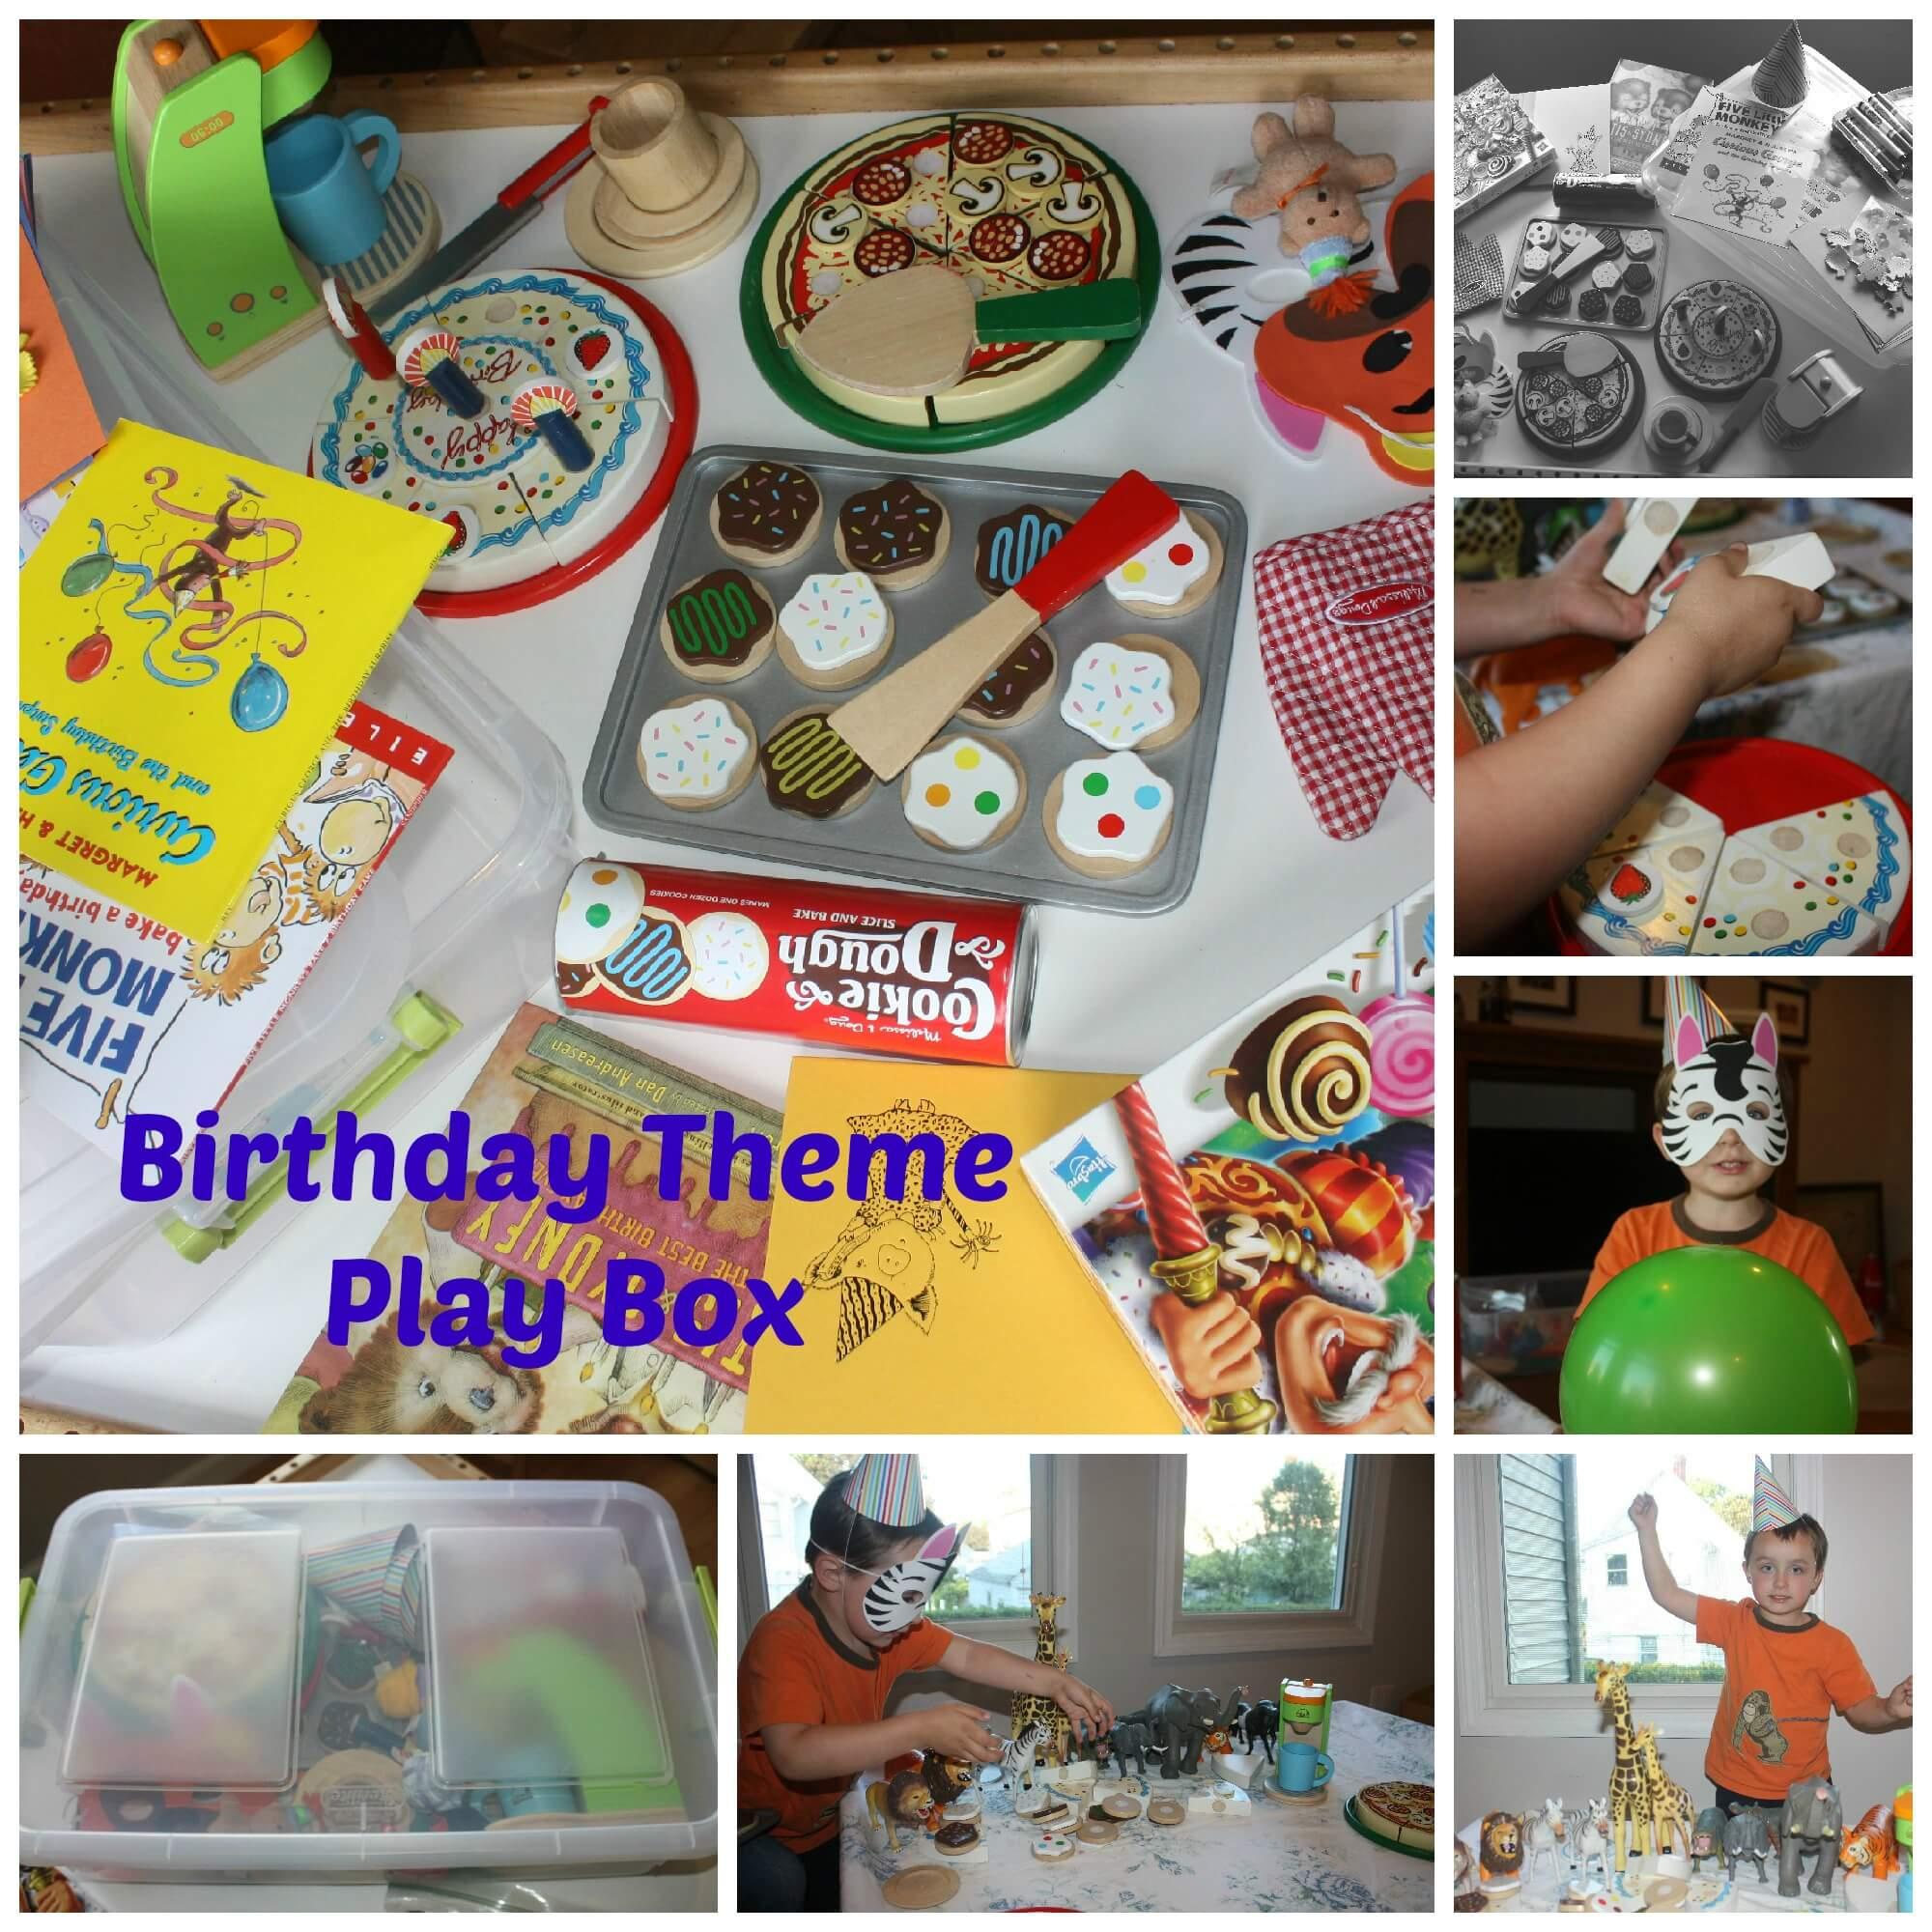 Birthday Party Theme Play Box